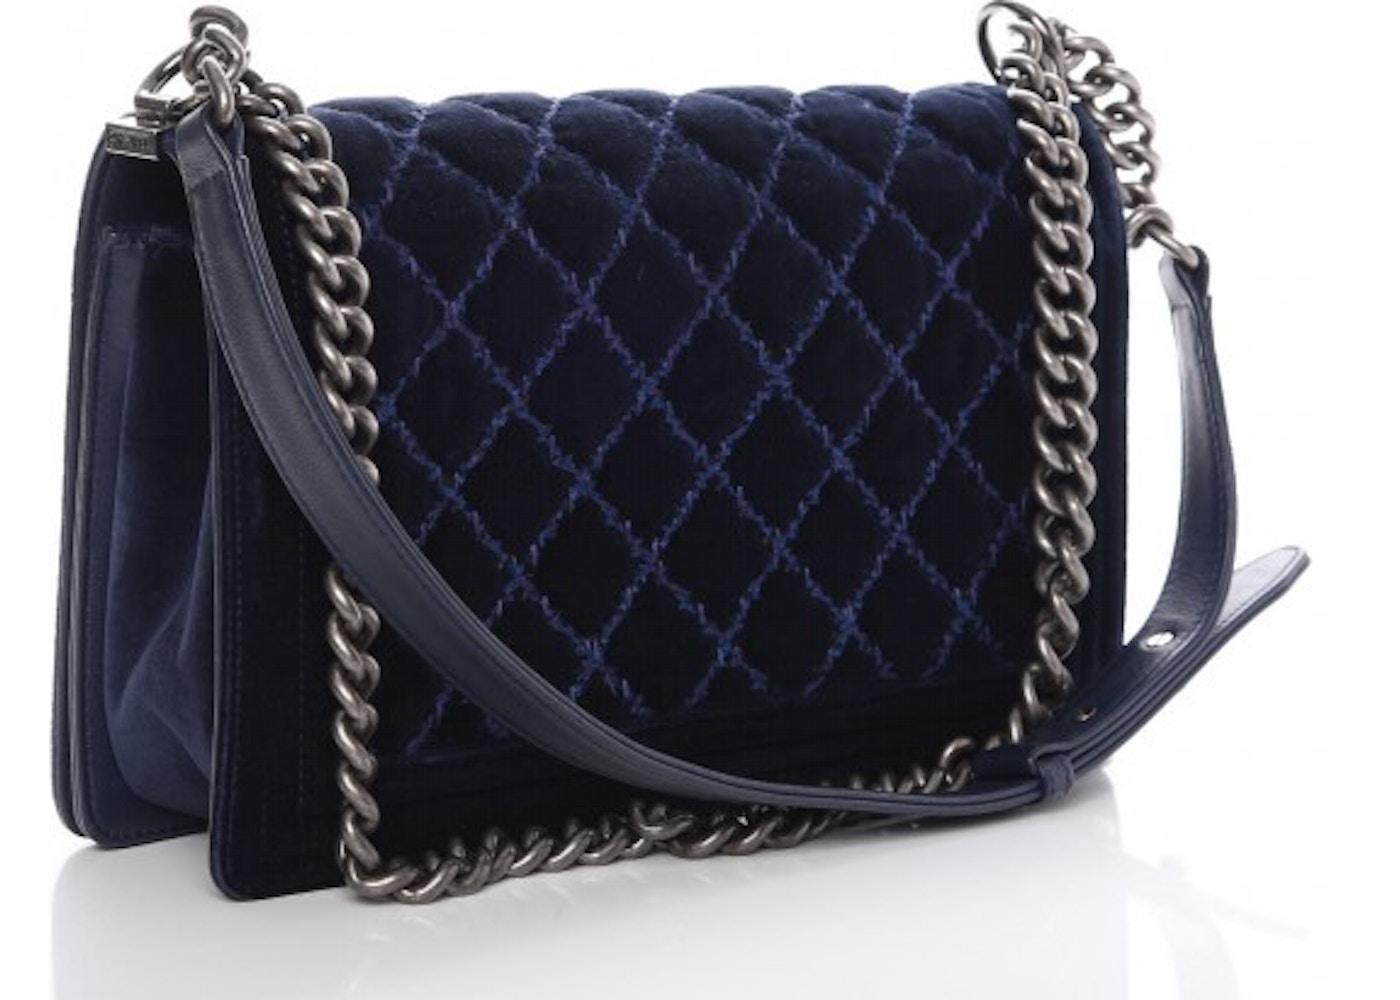 ac5a22404207 Chanel Boy Flap Quilted Velvet Ruthenium-tone New Medium Navy Blue